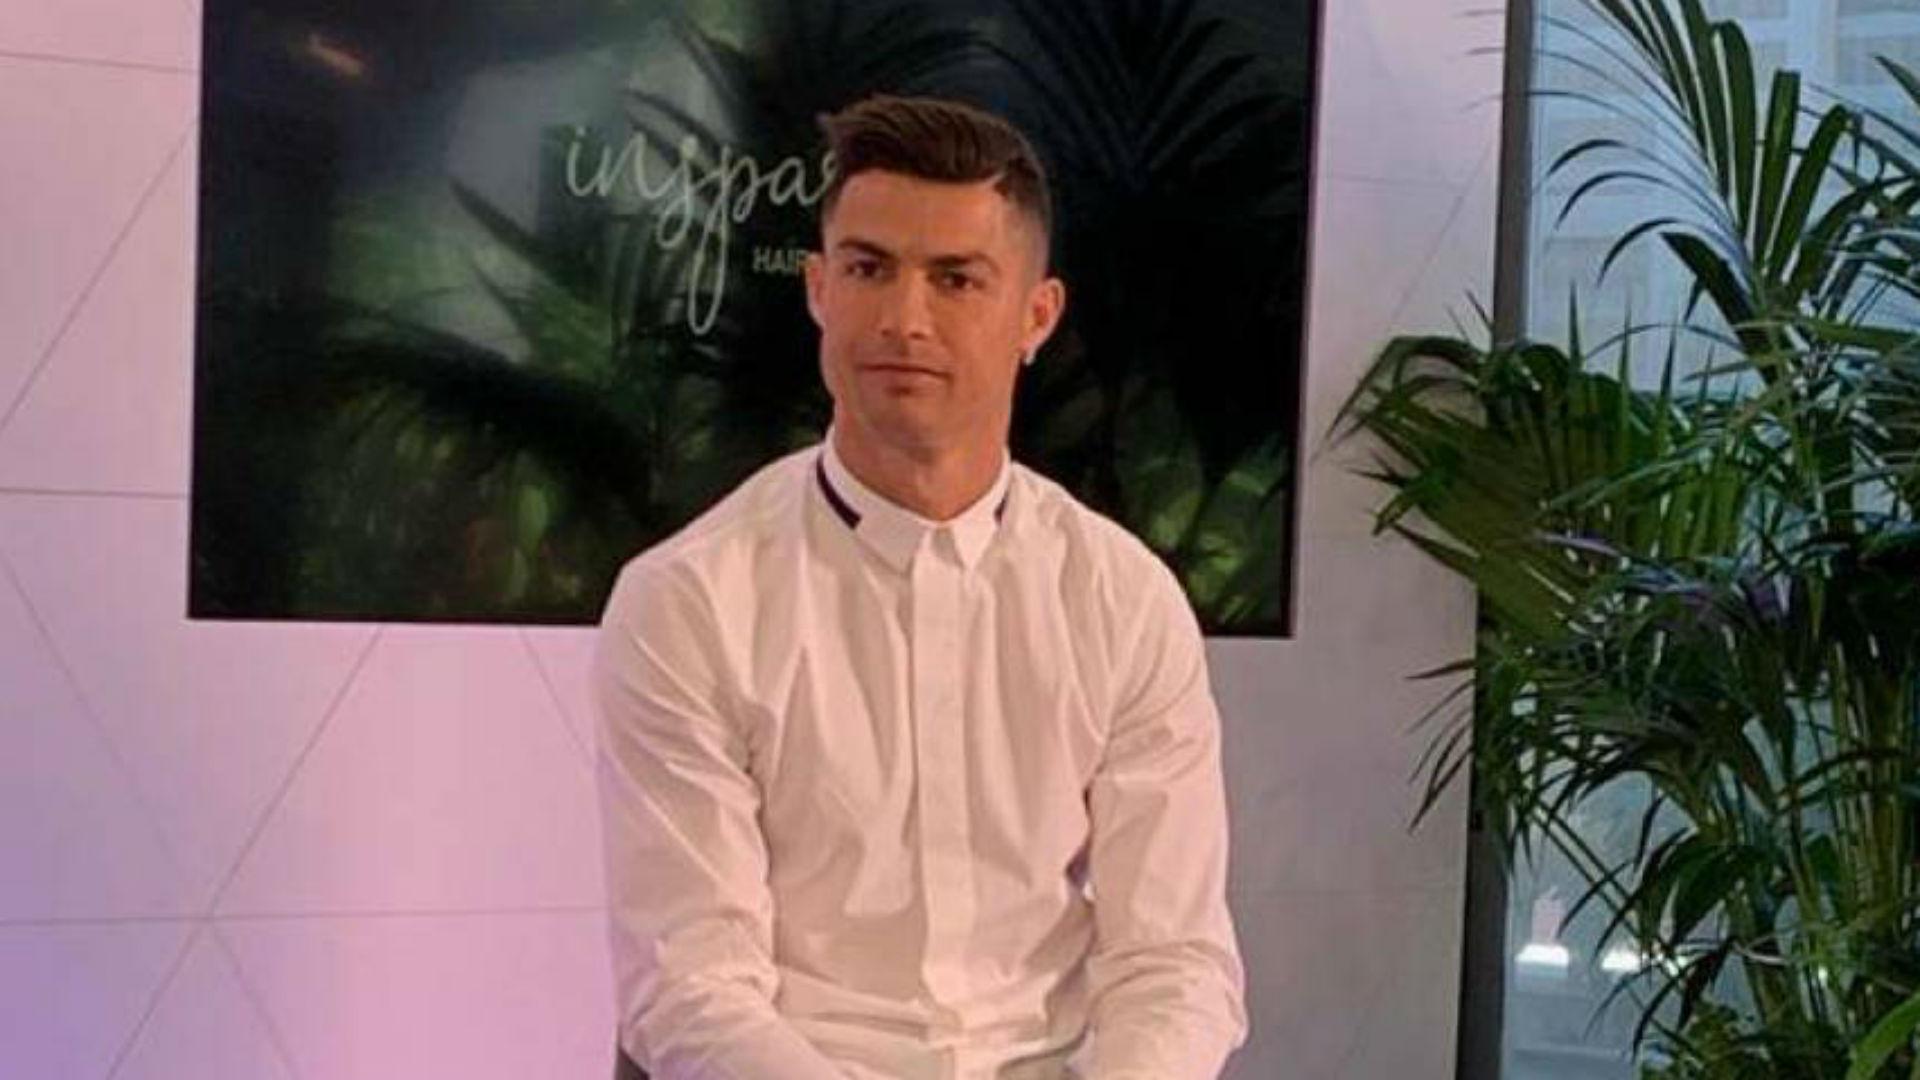 La UEFA inicia investigación disciplinaria a Cristiano Ronaldo